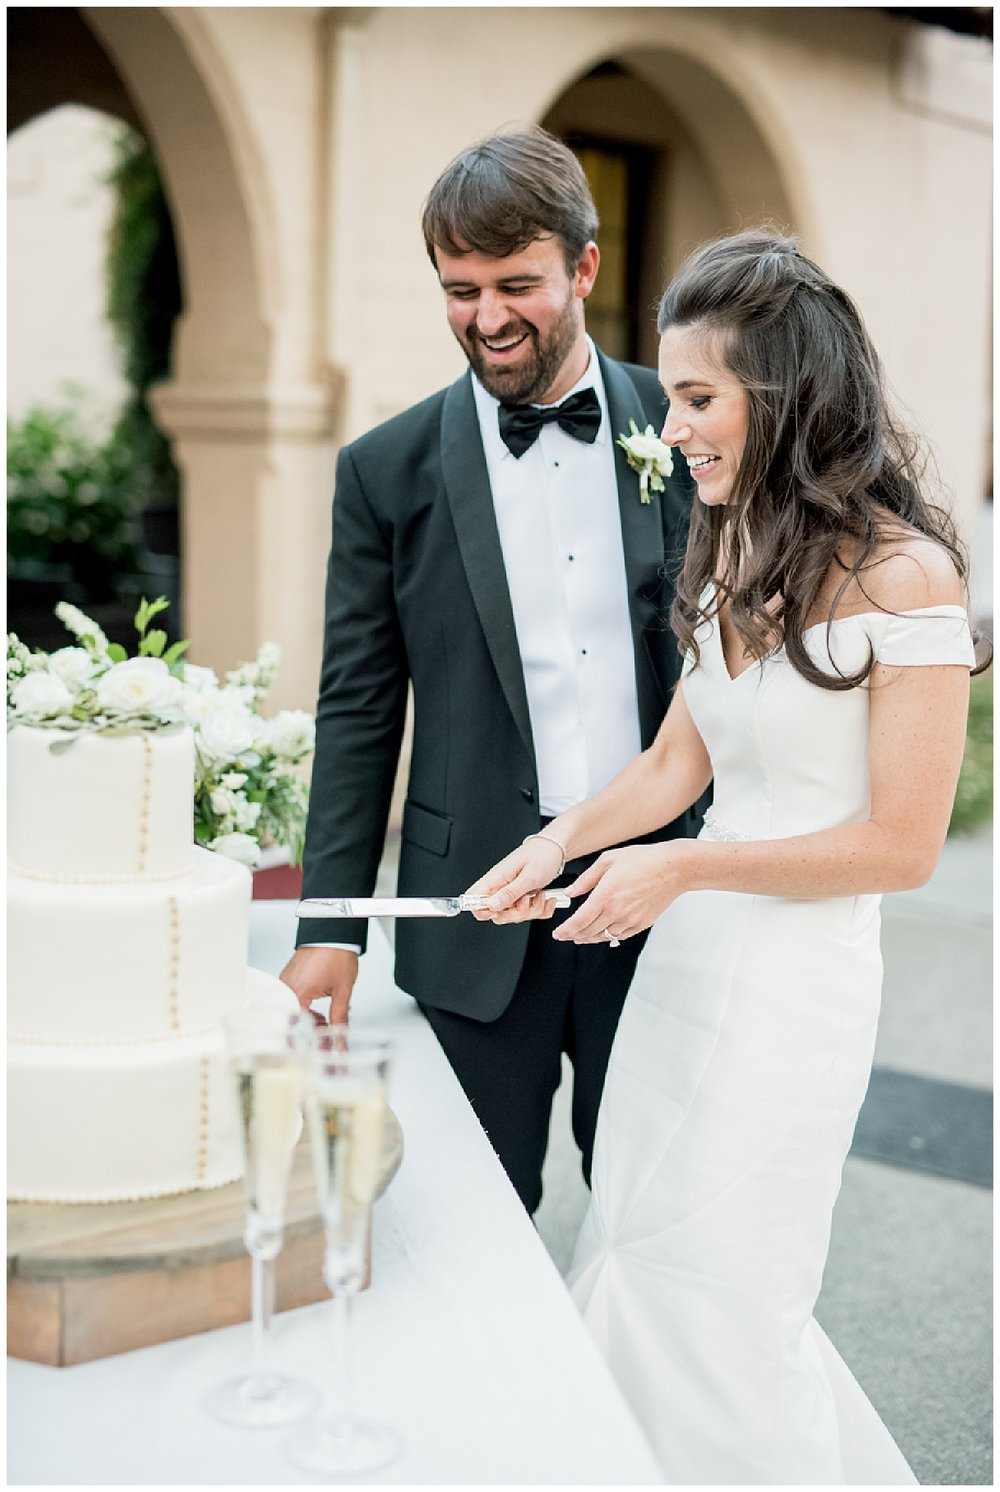 Janine_Licare_Photography_San_Francisco_Wedding_Photographer_0166.jpg